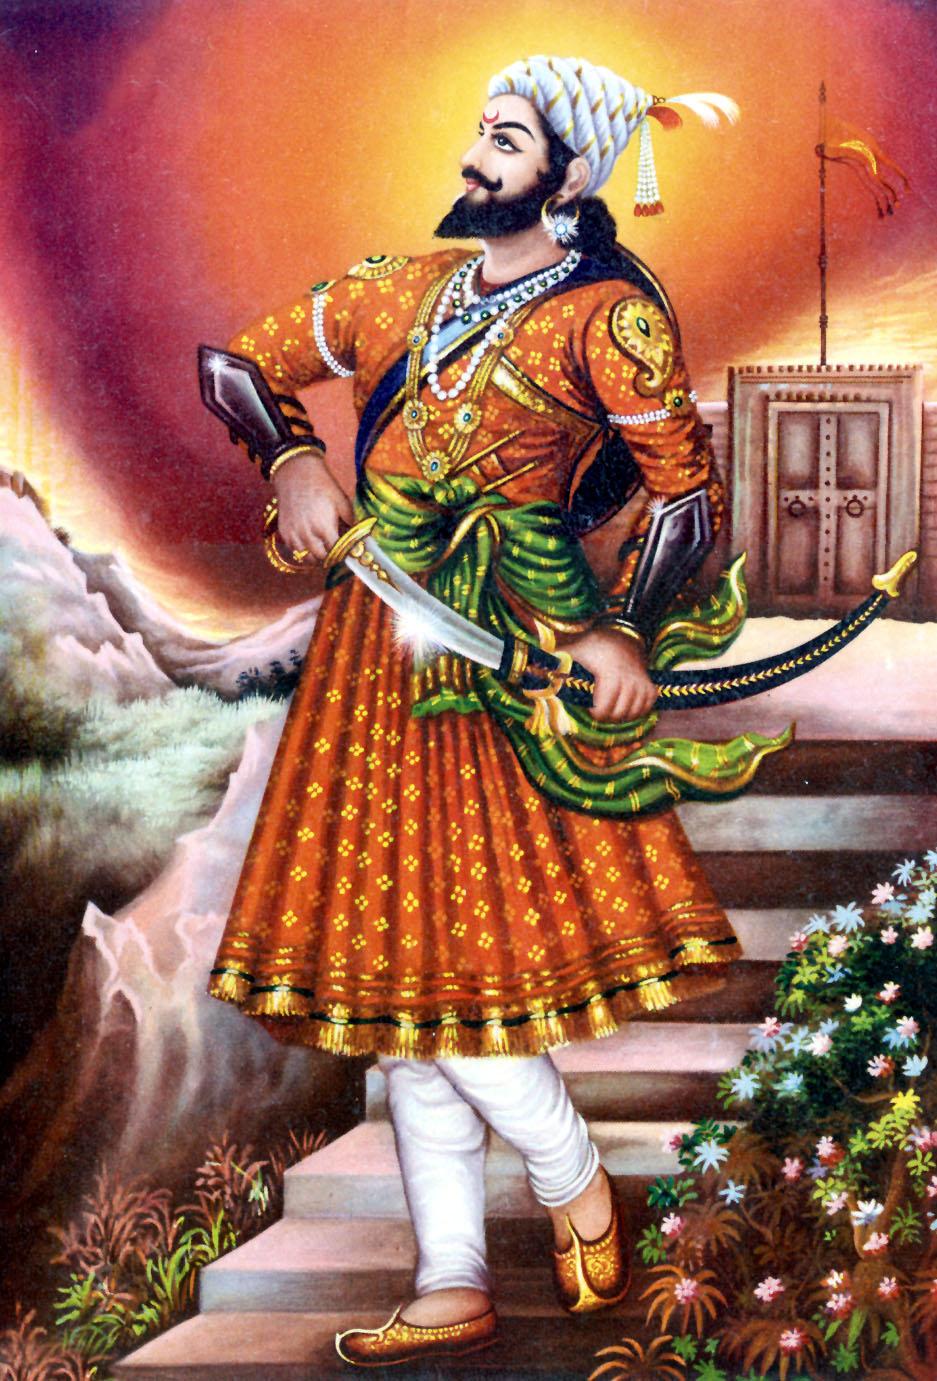 MoBiLeKiDA.CoM - New Bollywood Songs | Marathi Songs